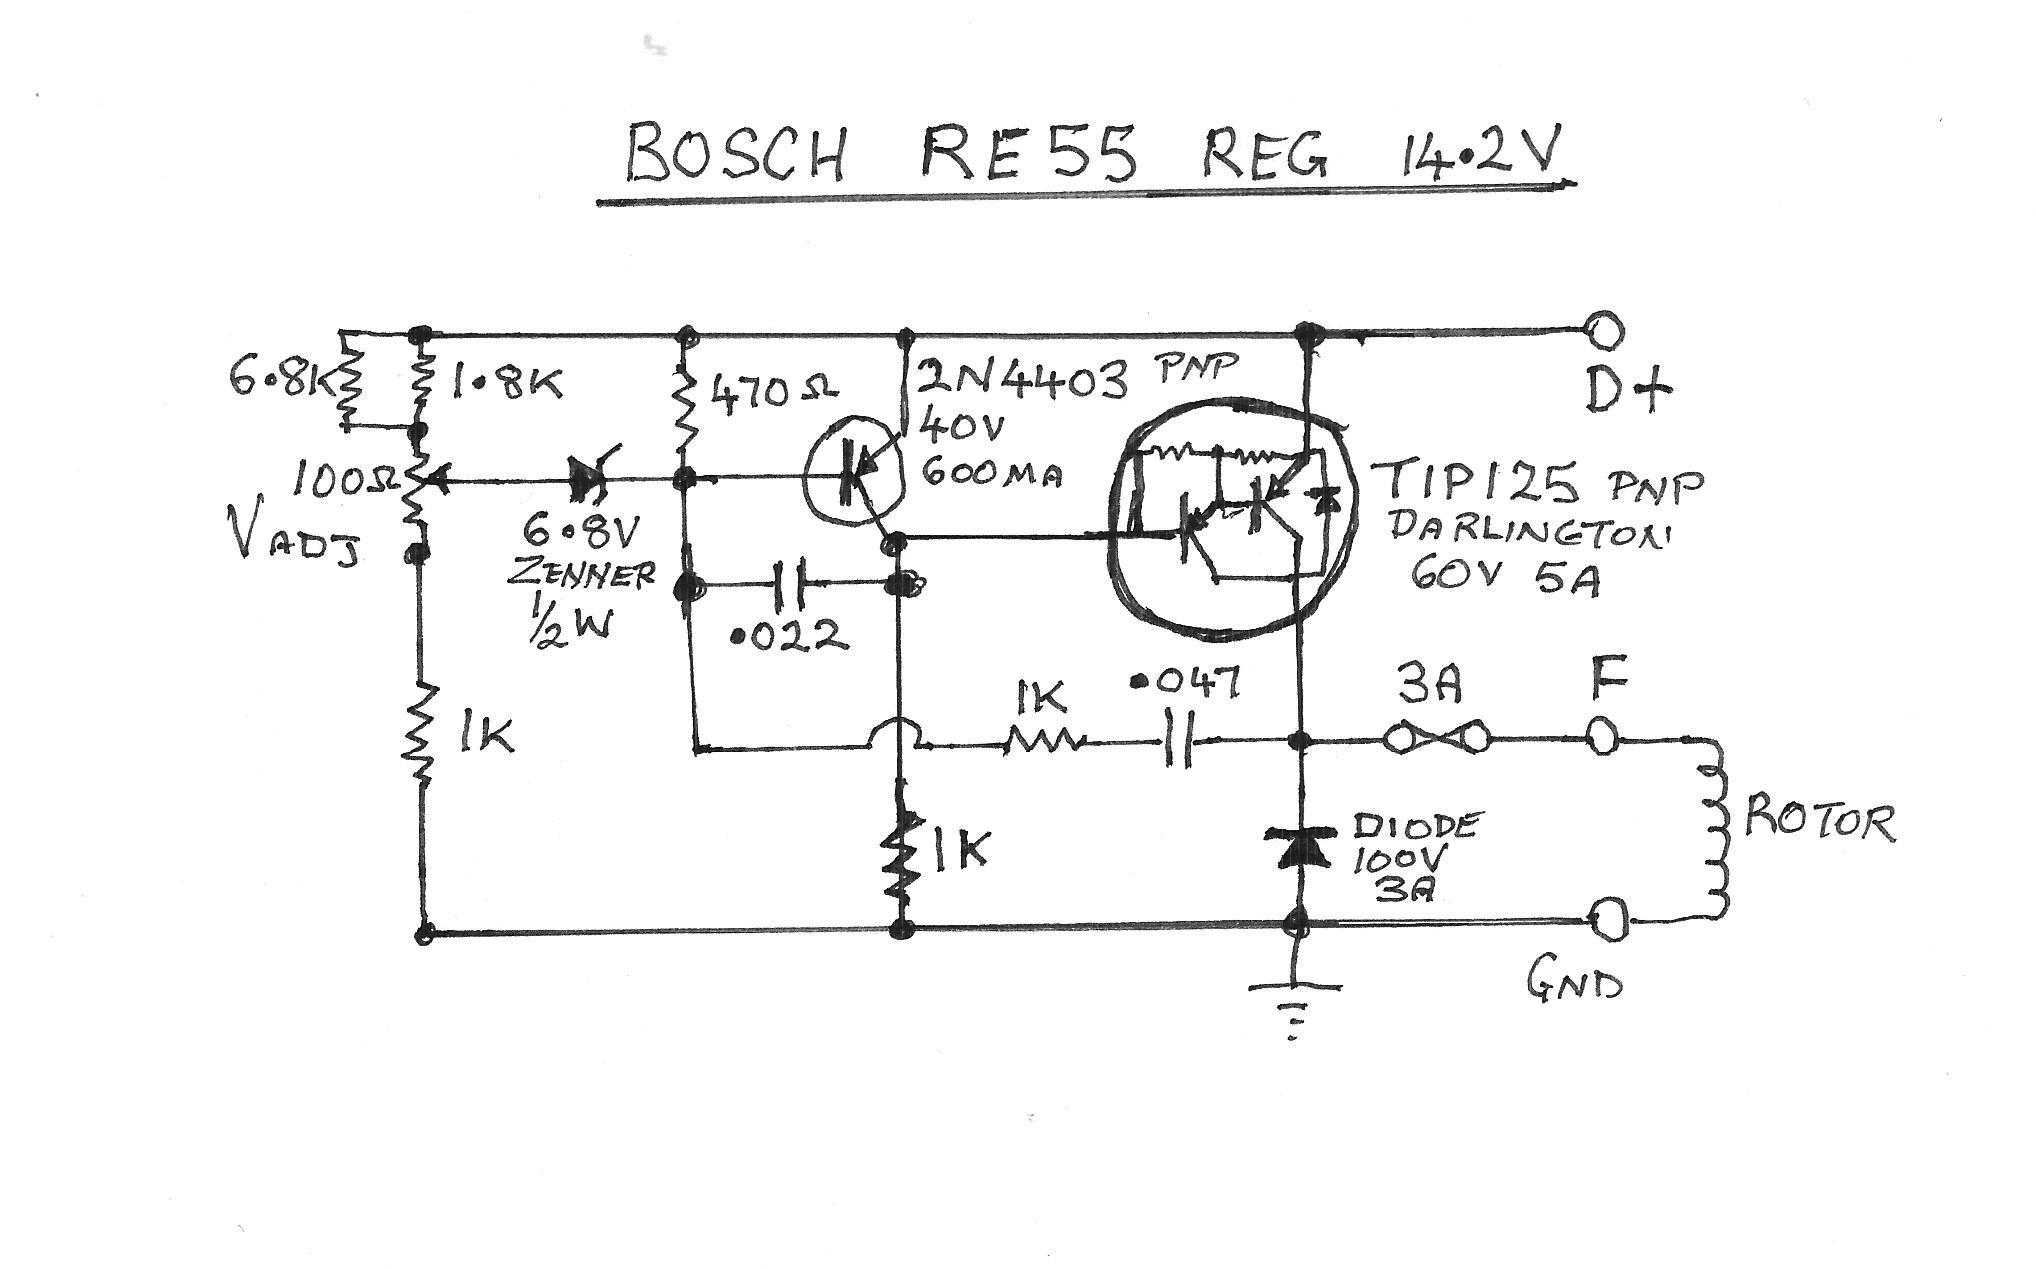 Fine Ford Regulator Wiring Diagram Electrical Circuit Alternator